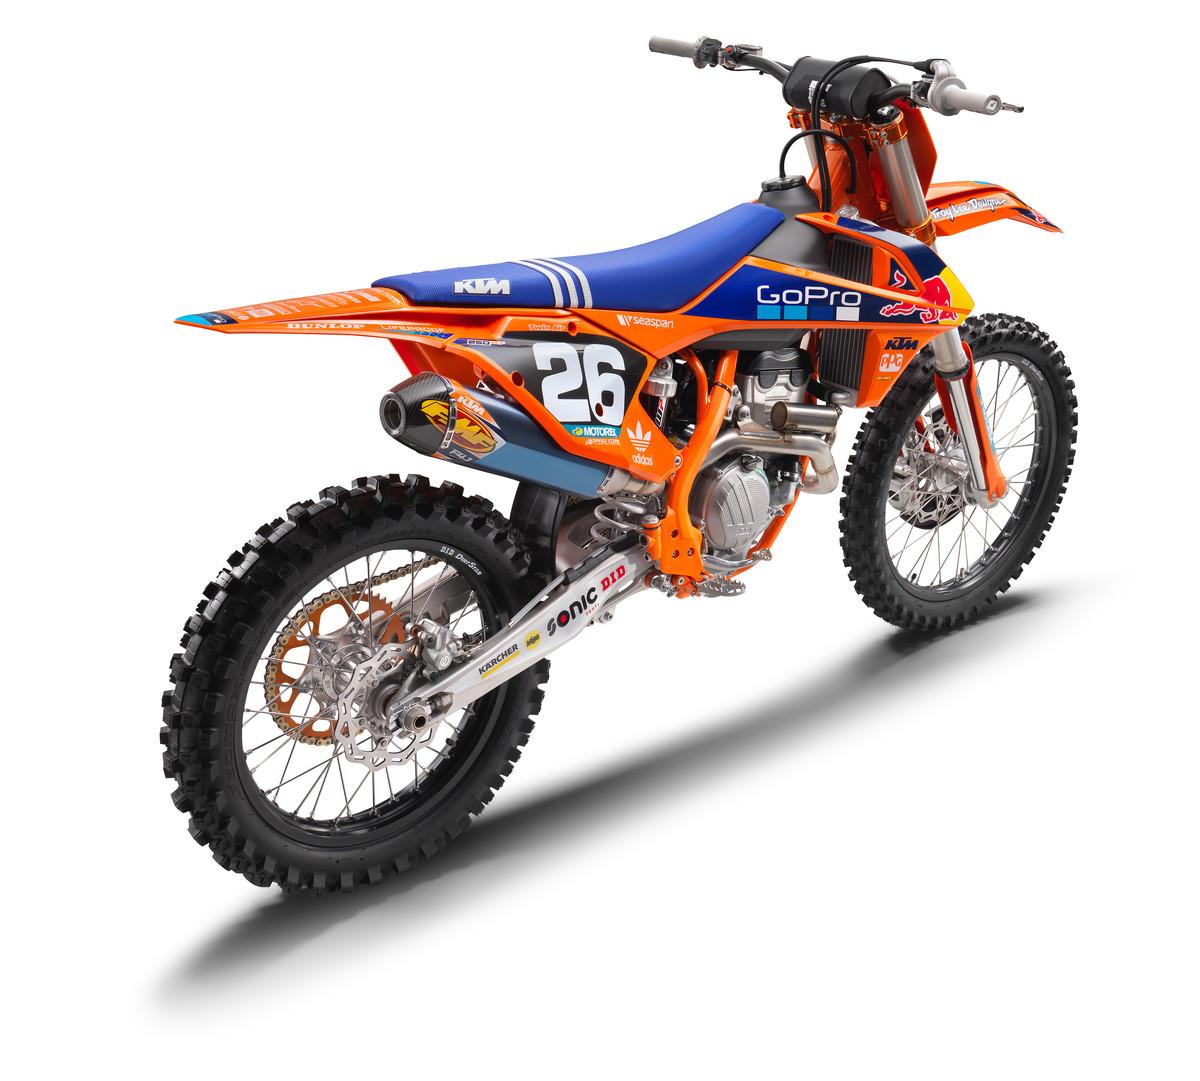 160465_ktm-250-sx-f-factory-edition-my-2017